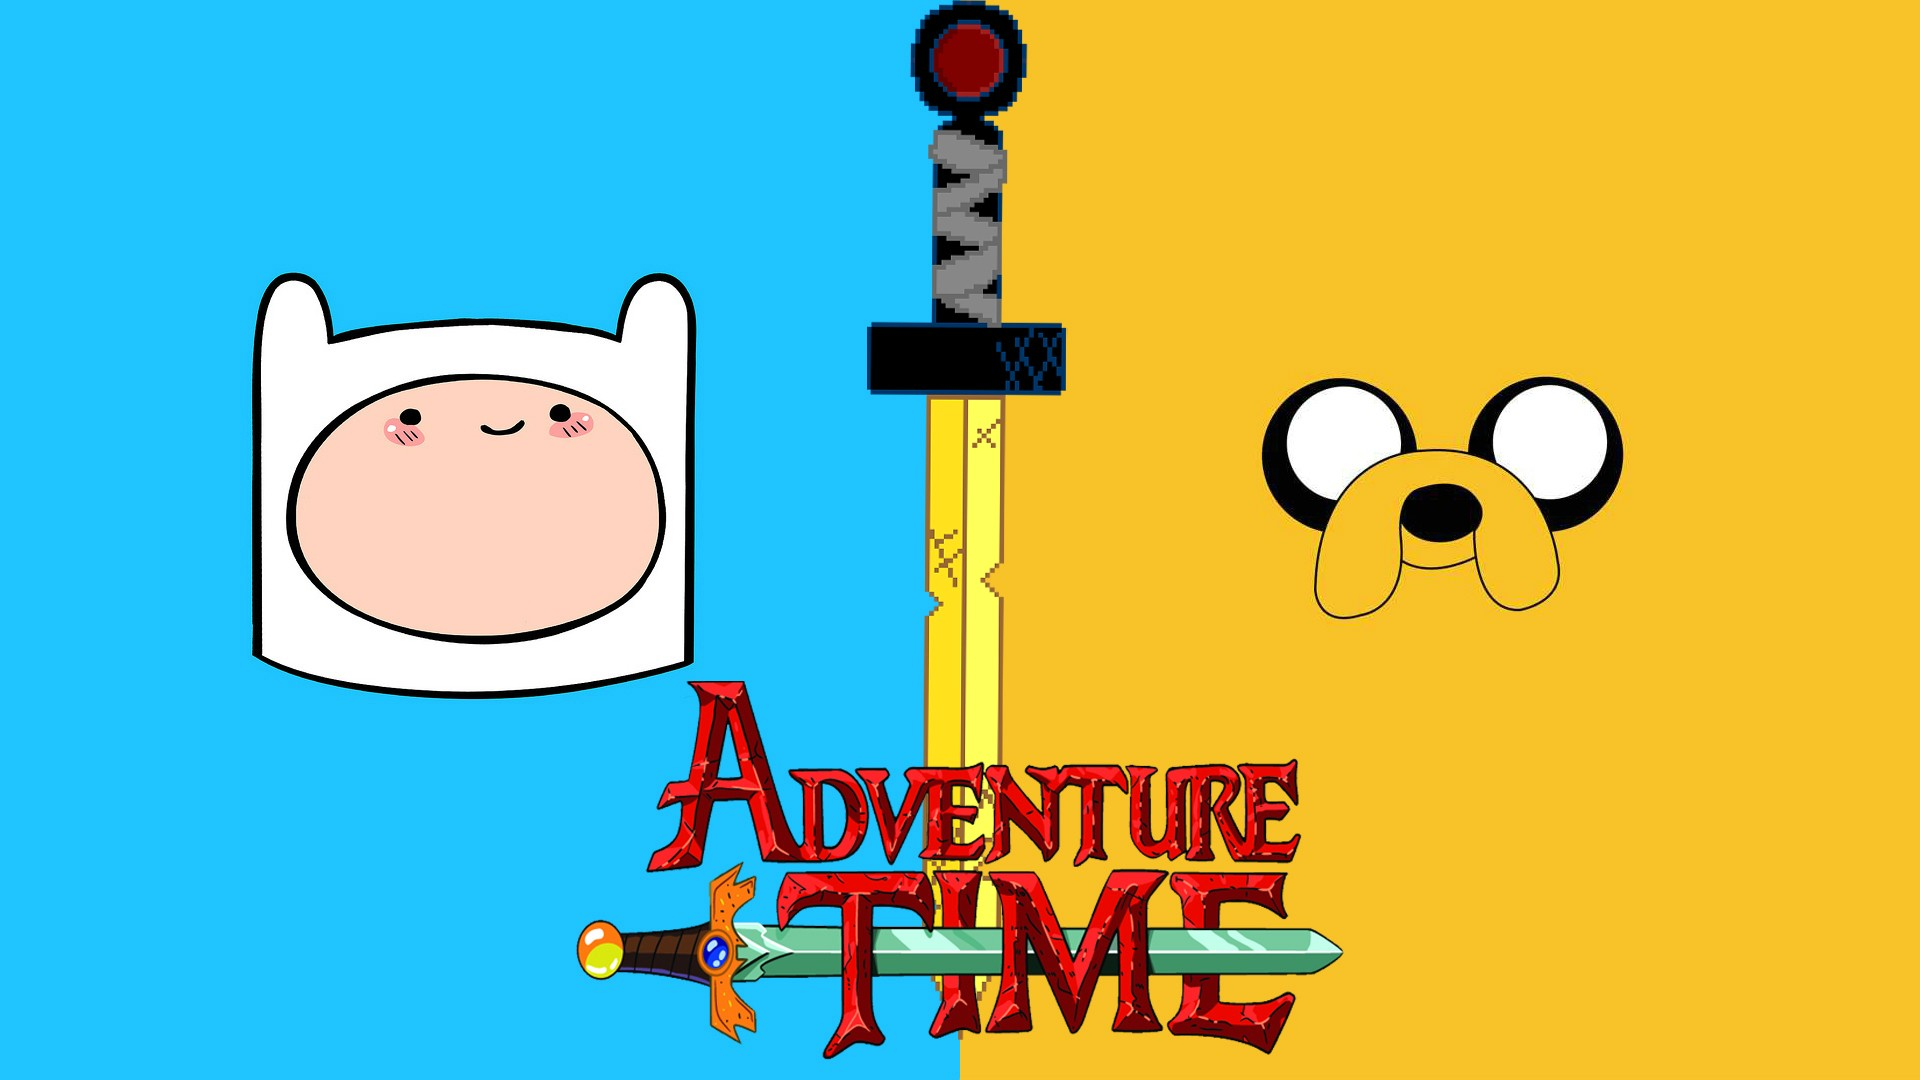 adventure time wallpaper 1920x1080